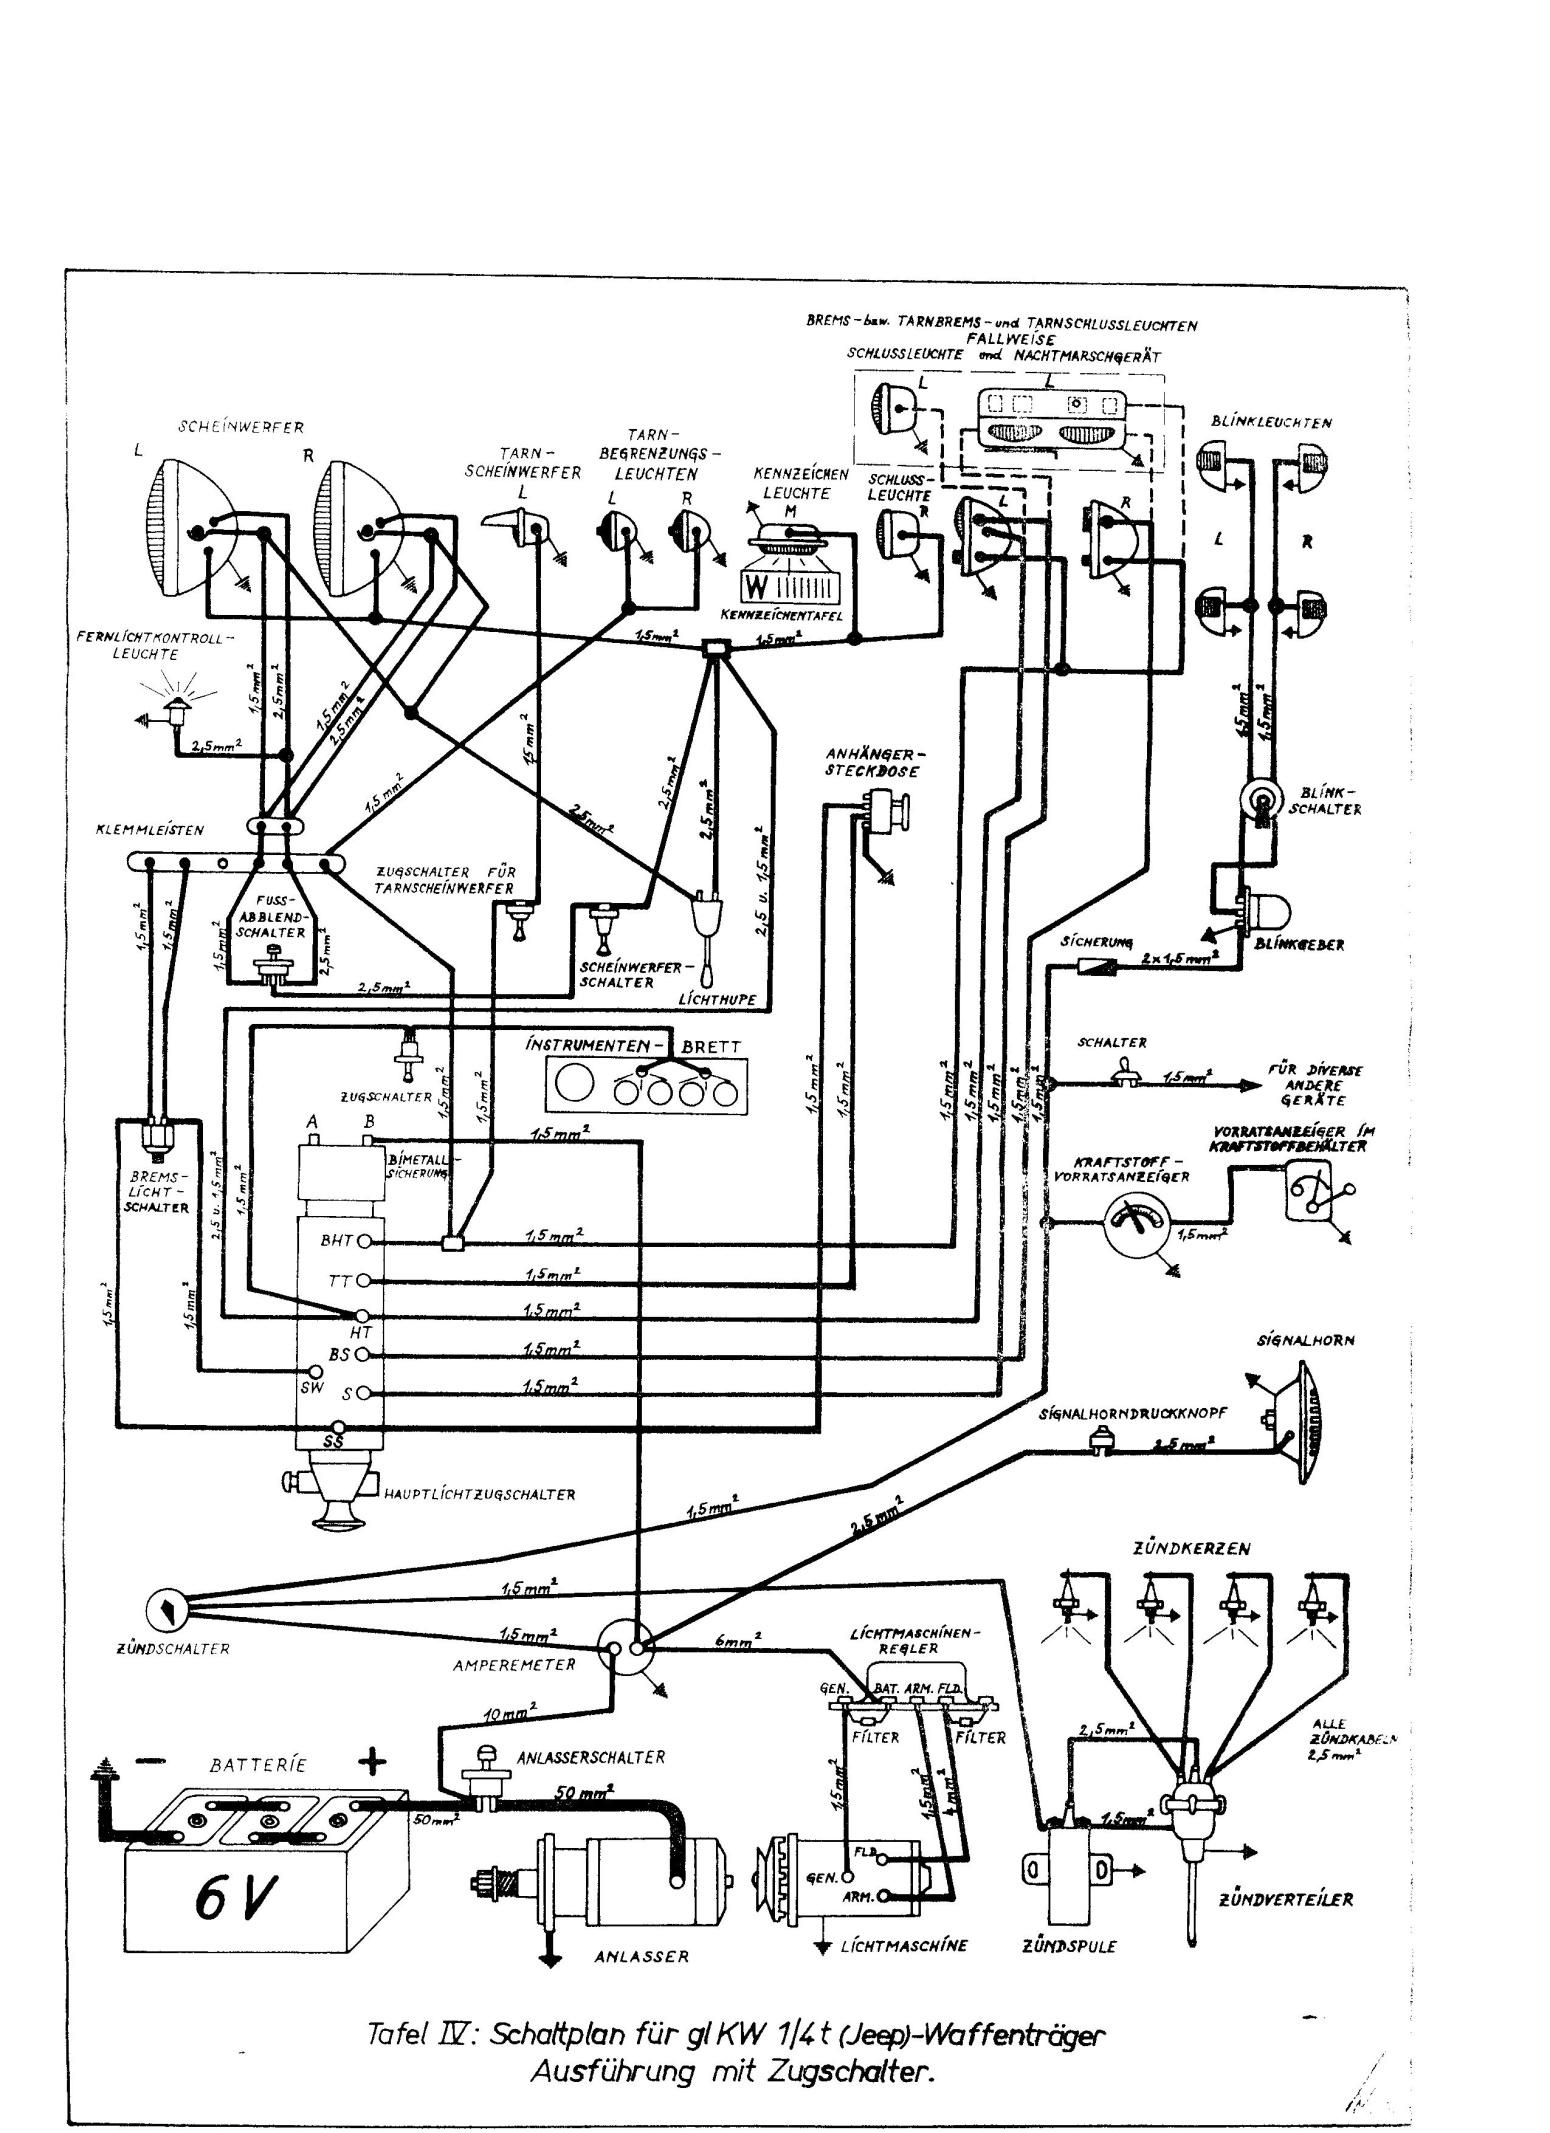 D:\Archiv Nemeth\Fzg-Gerät-Ausrüstung\Fahrzeuge\Mehrspurige Kfz\BH Fahrzeuge\Jeep\TV 9-803 Ausschnitt\Tafel IV.jpeg